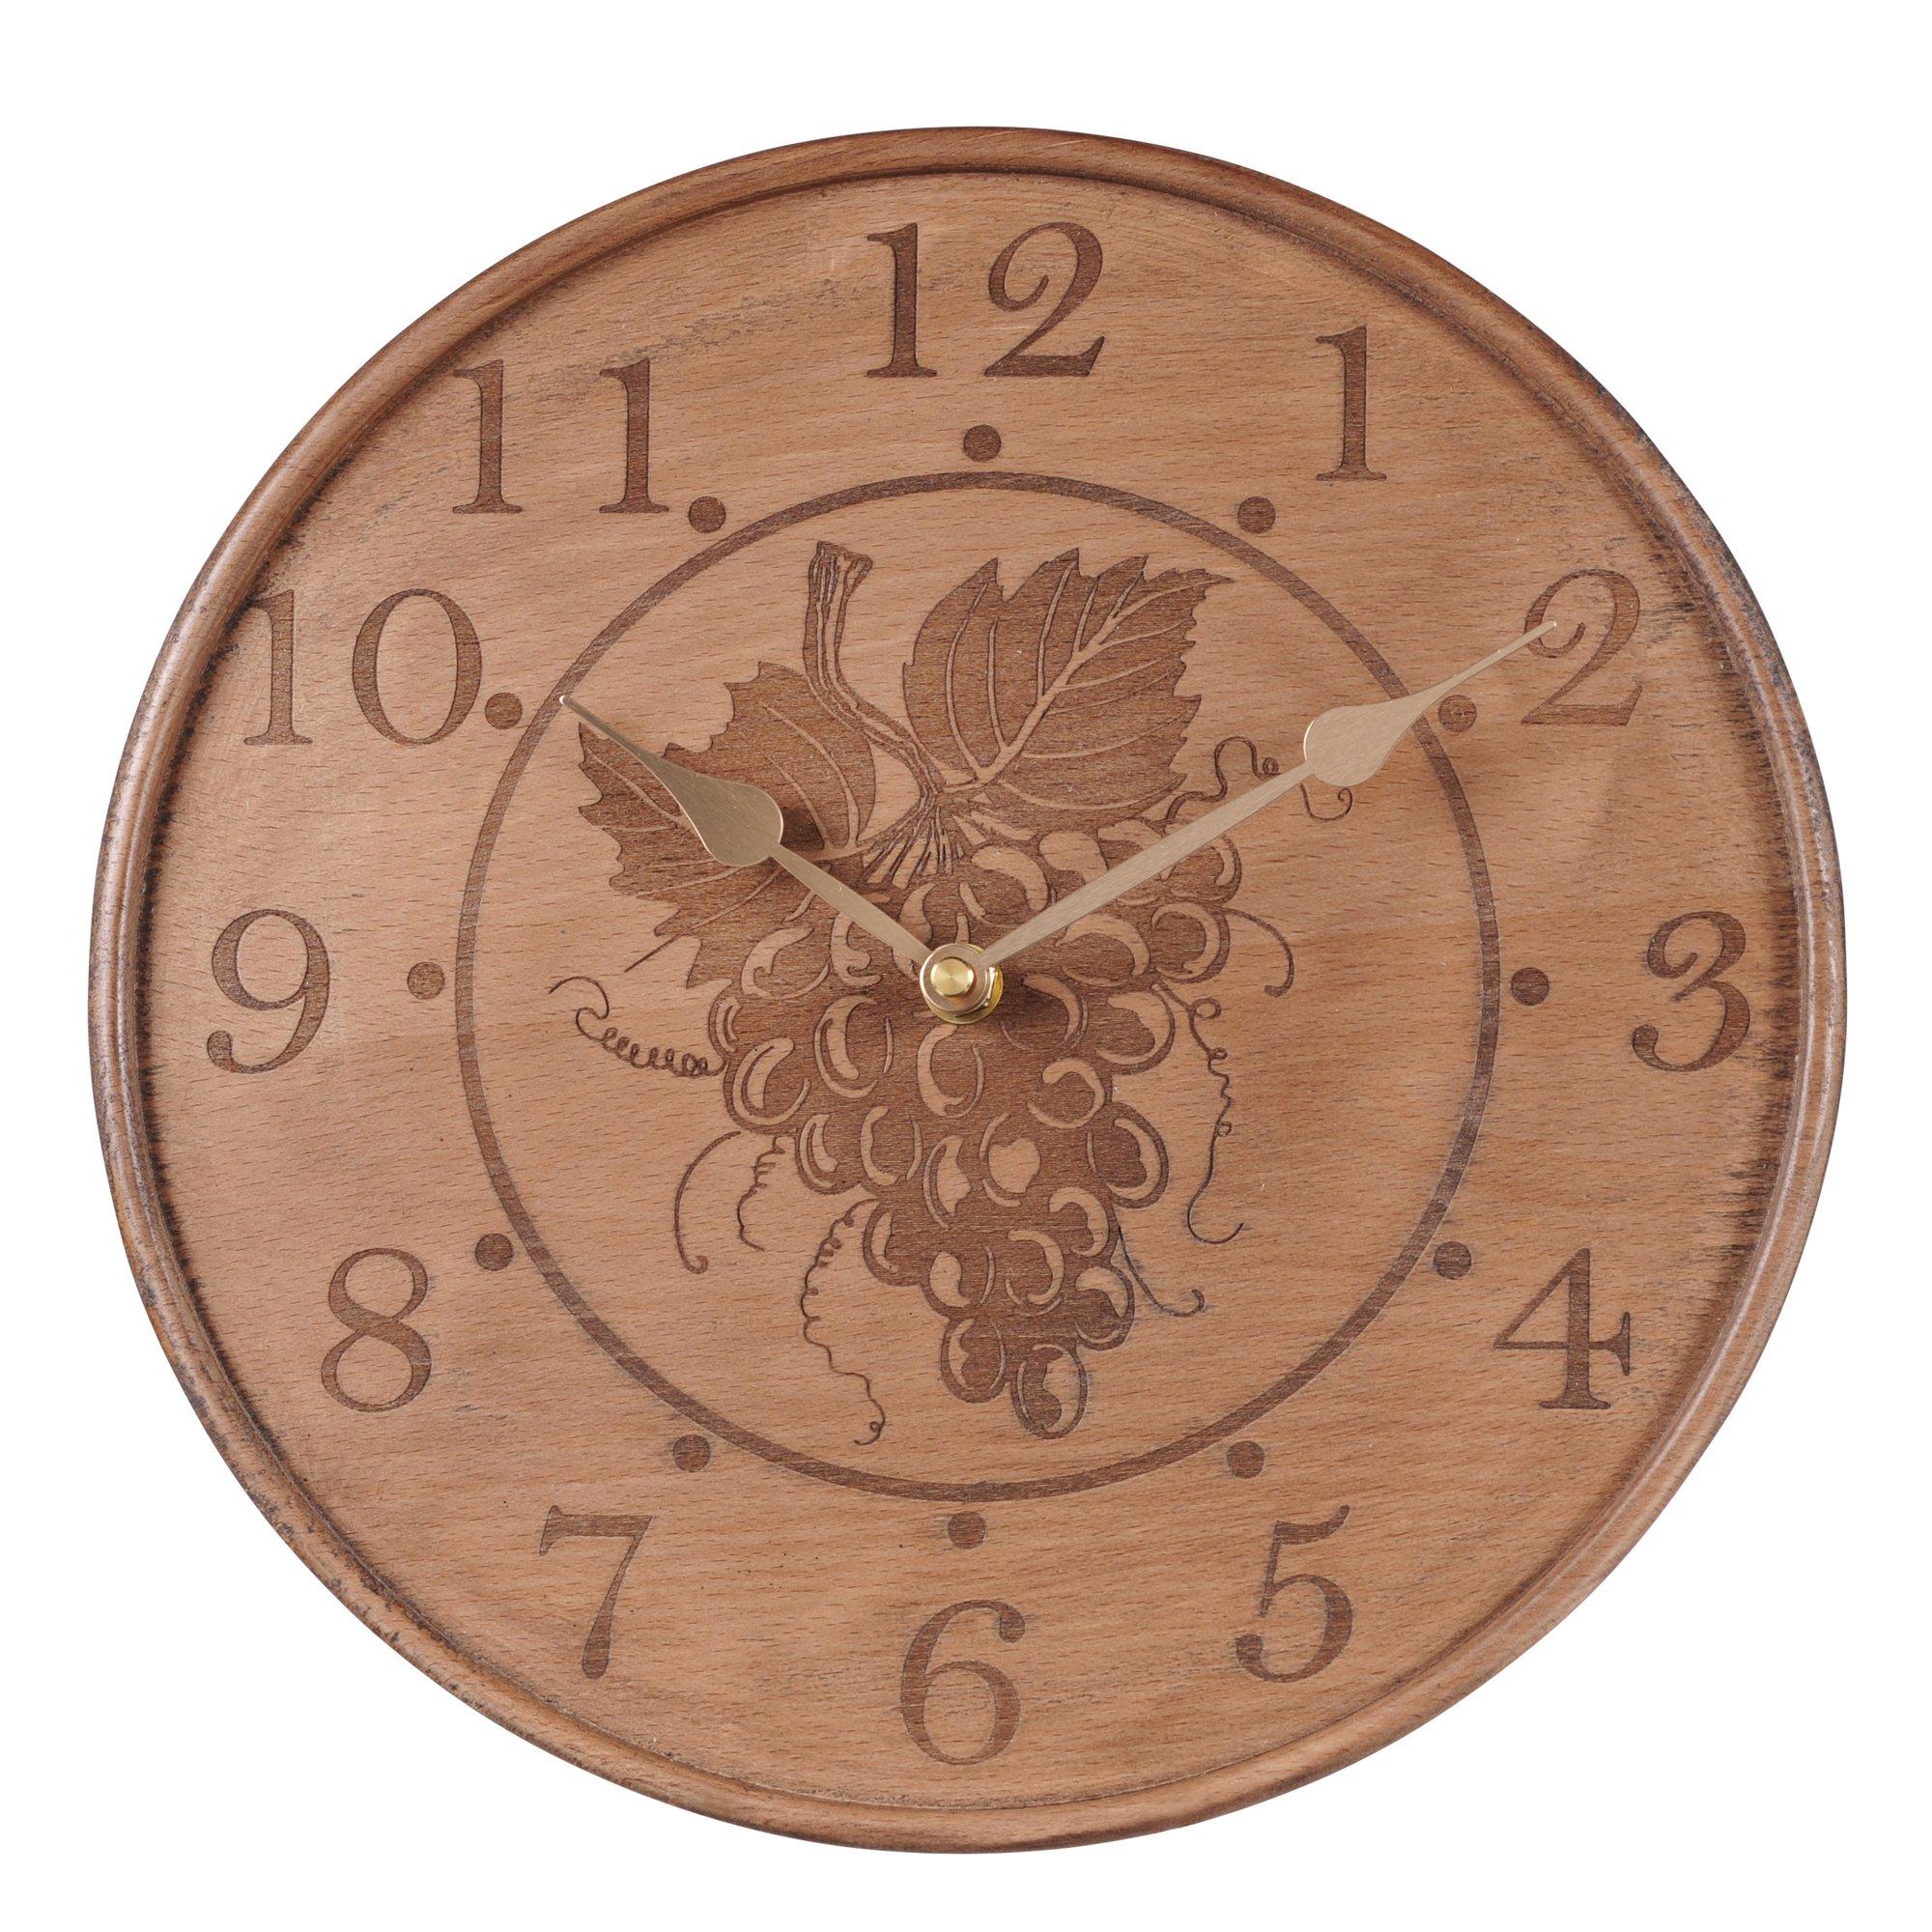 Grasslands Road 2-Pack In Vino Veritas Carved Grapes Wooden Clock, 11-Inch